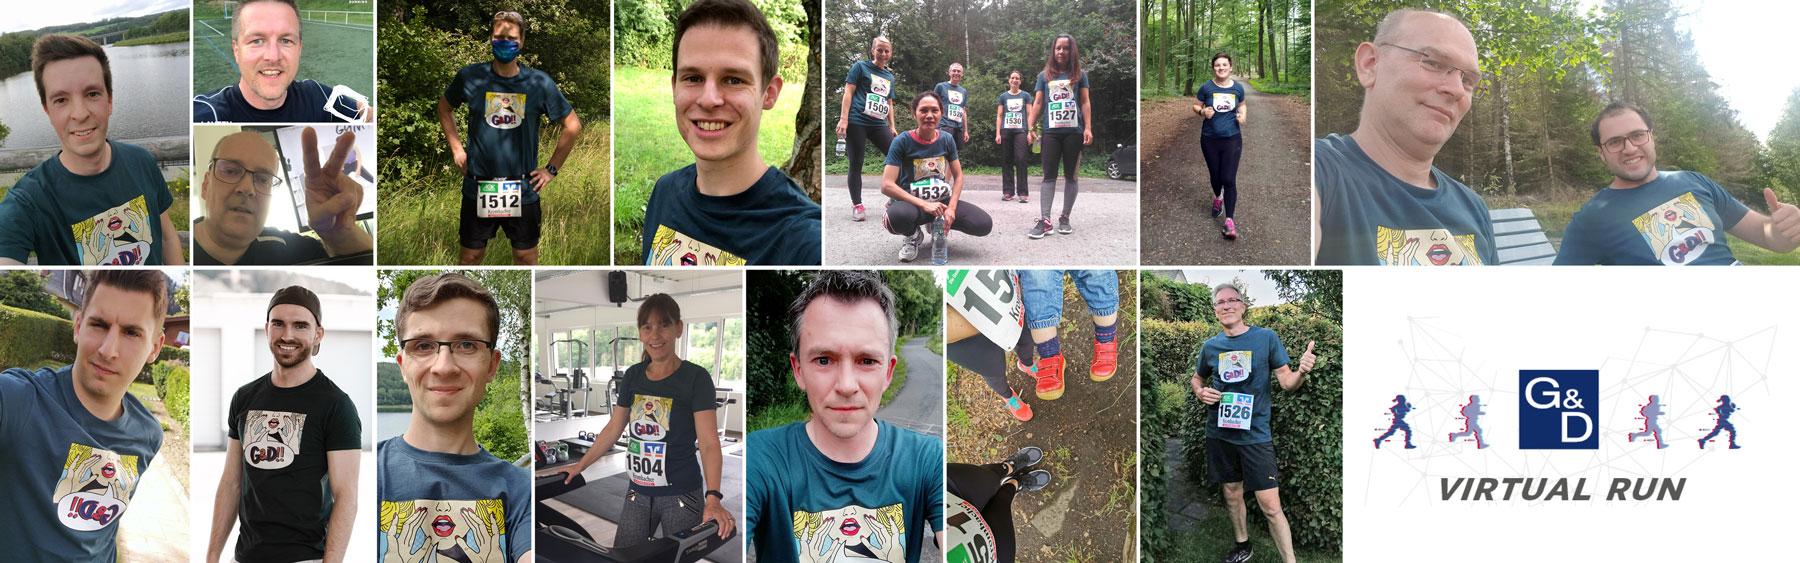 Virtual Run 2020 – Siegerländer AOK-Firmenlauf mal ganz anders